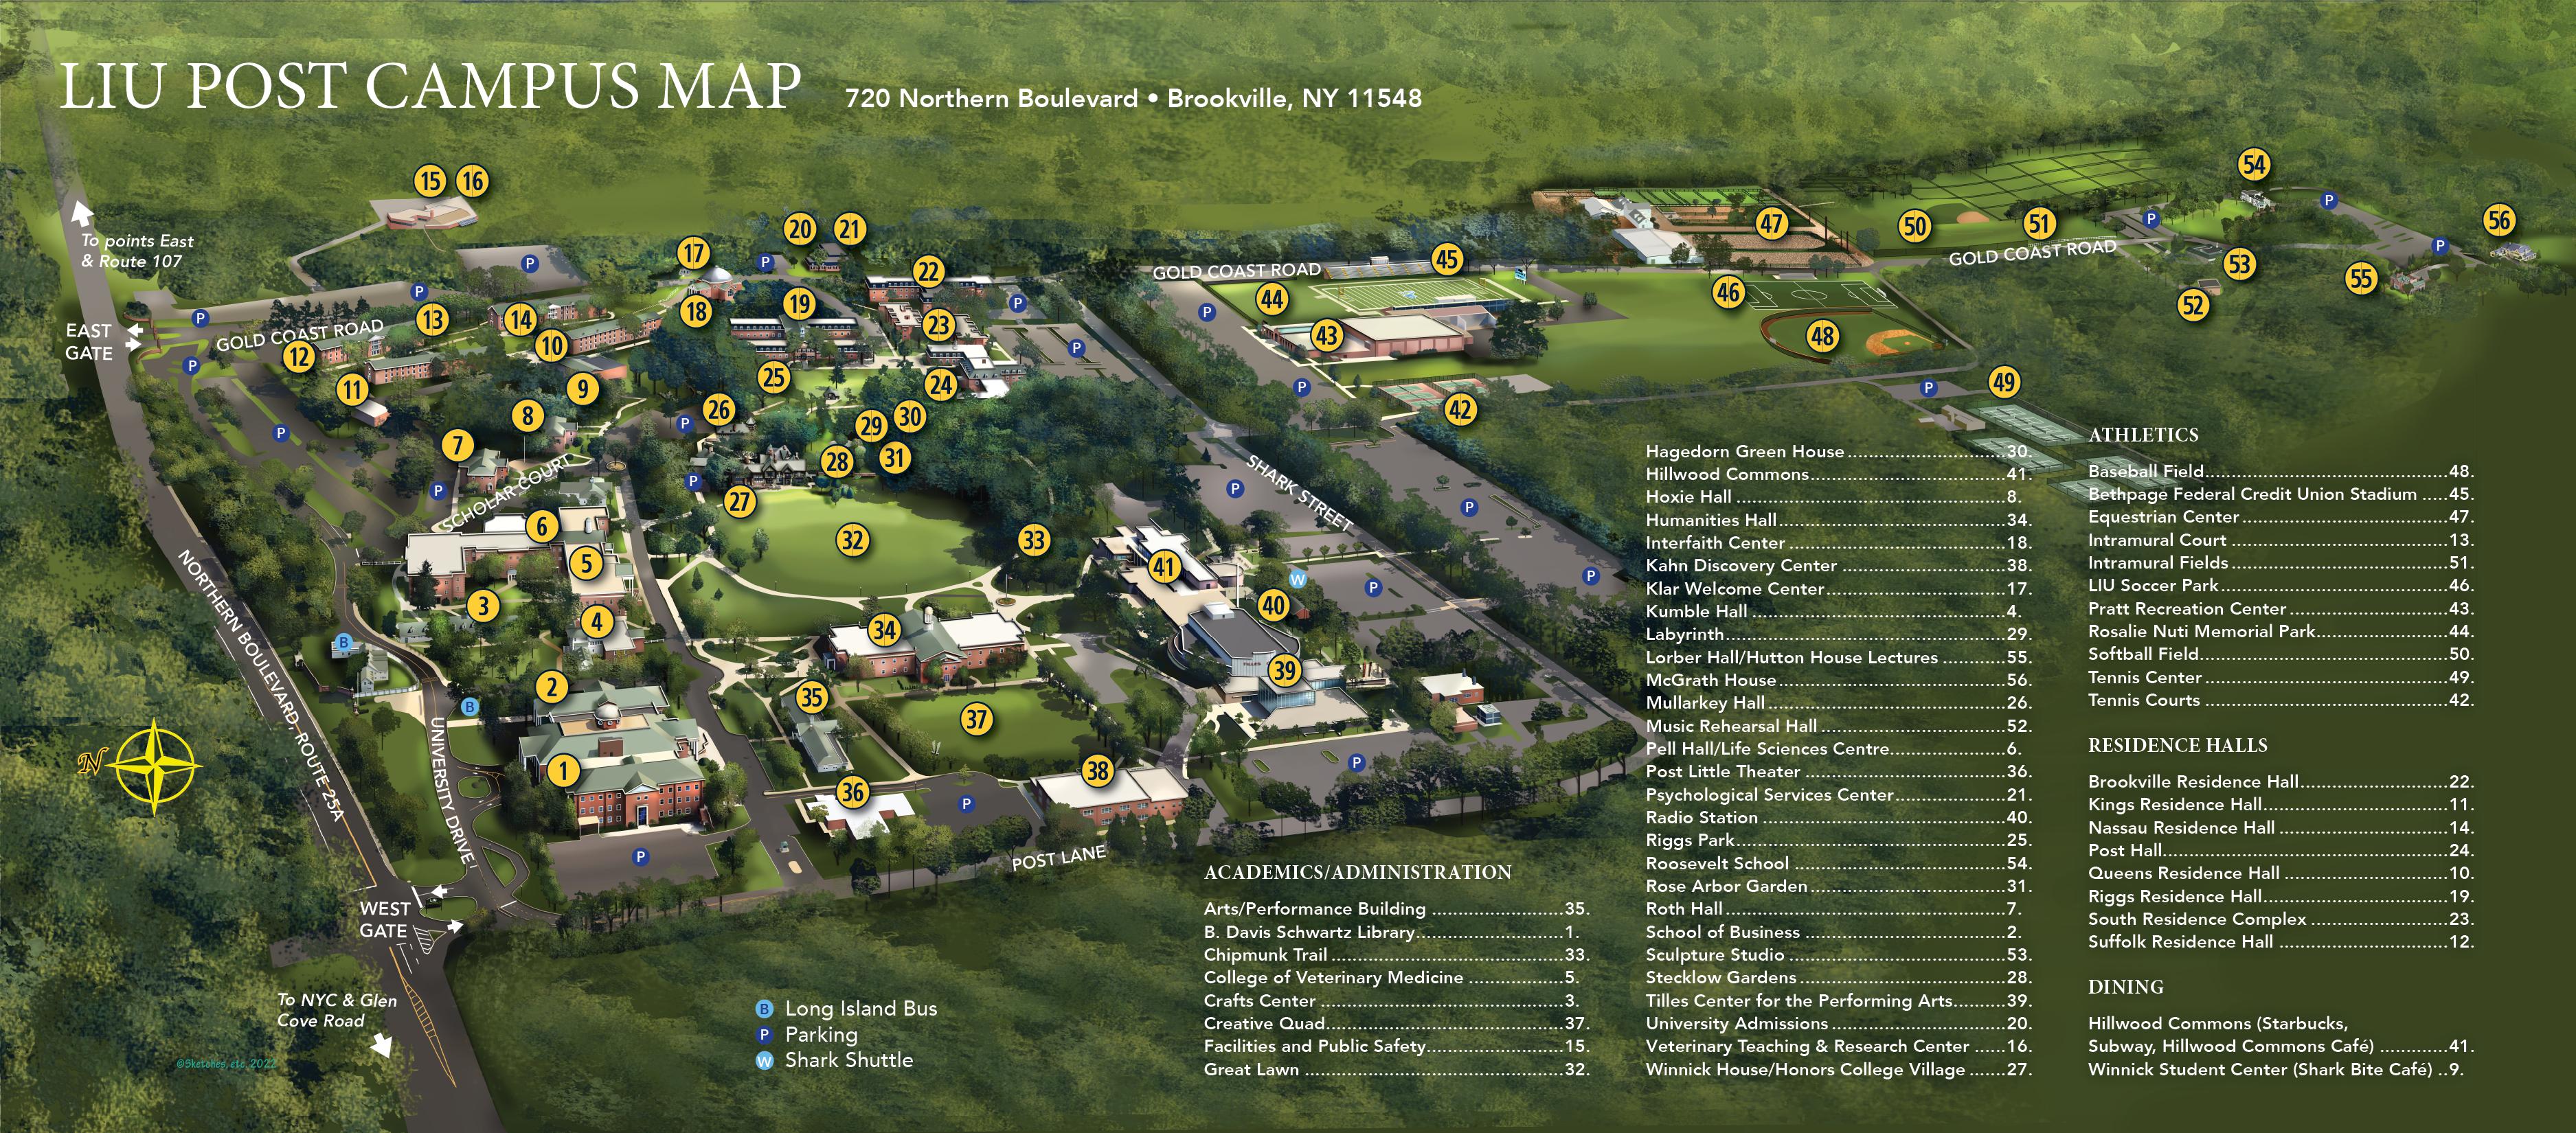 Liu Post Campus Map Campus Map | Long Island University